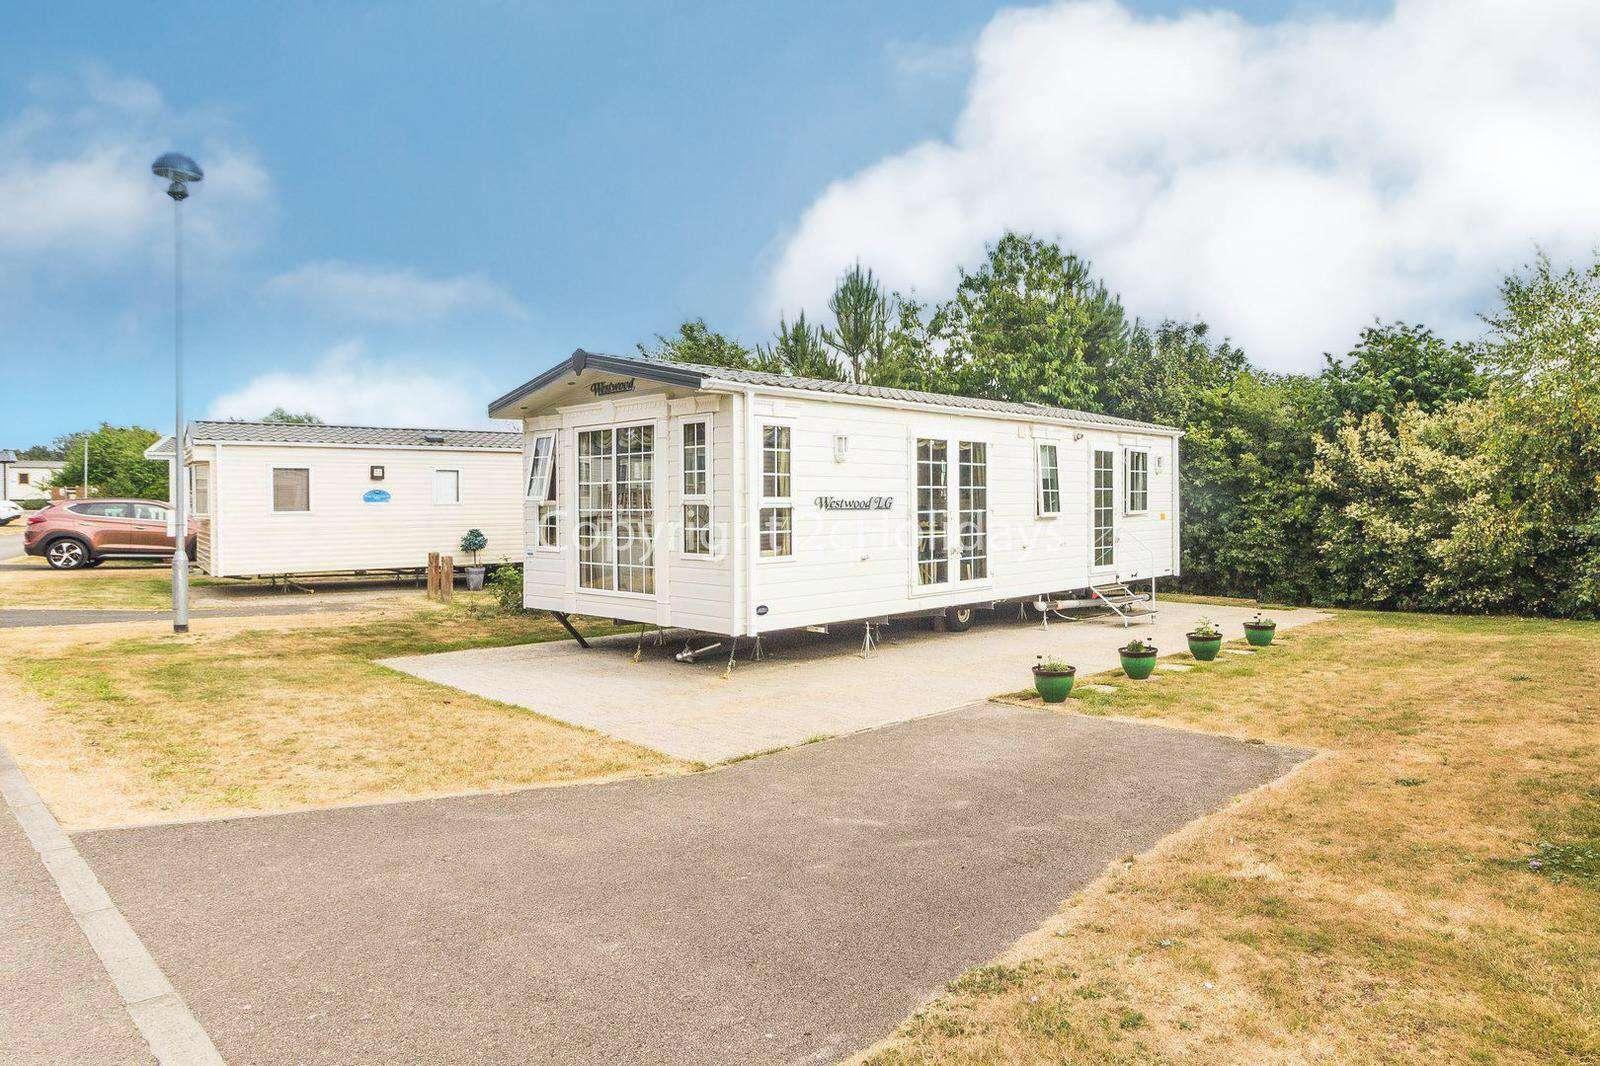 10017CW – Castle Walk area (Bure Village) 2 bed, 5 berth caravan. Ruby rated - property